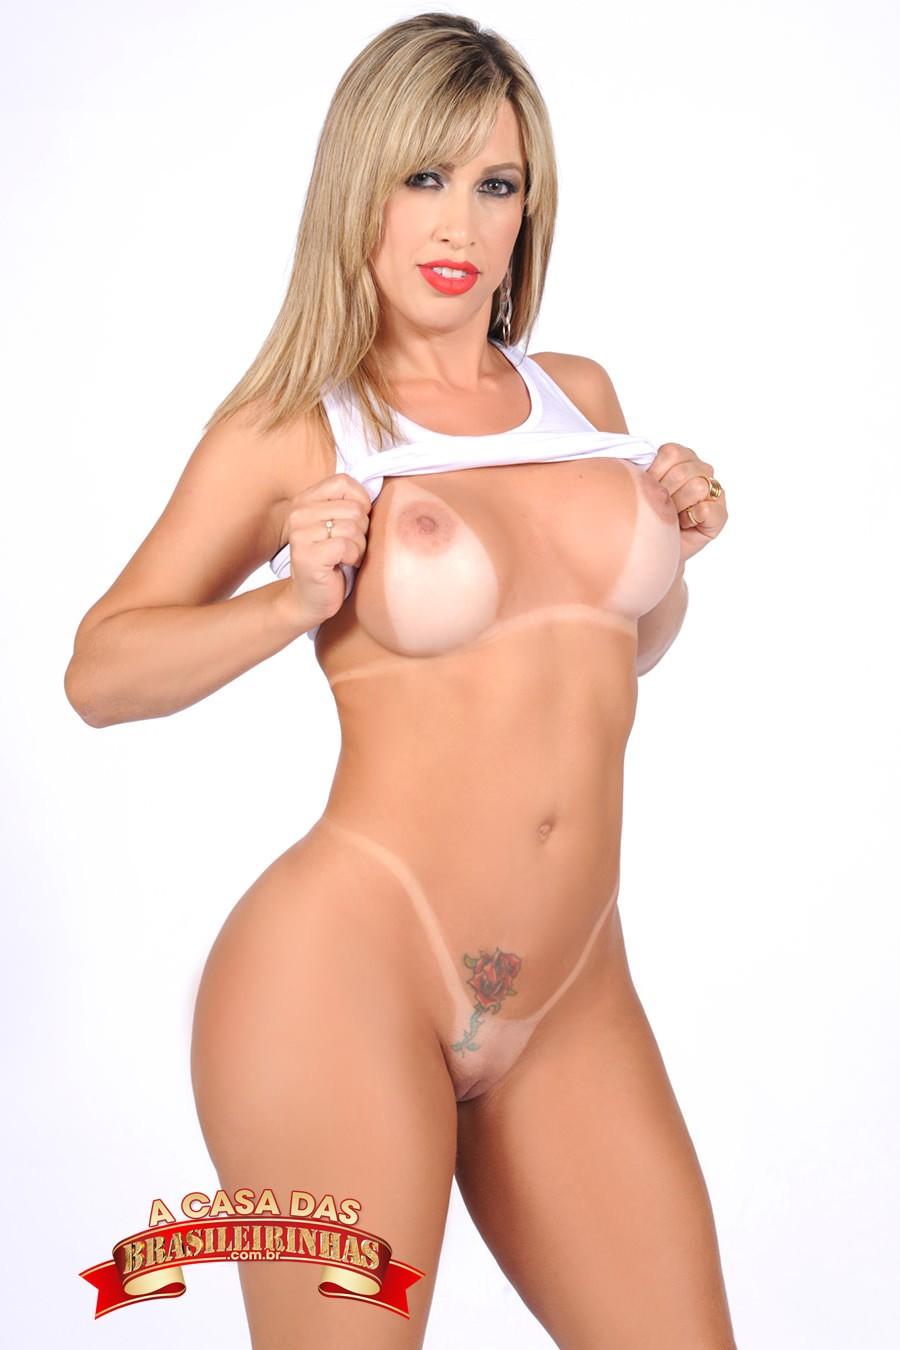 image Turma do sexo anal amateur brazilian